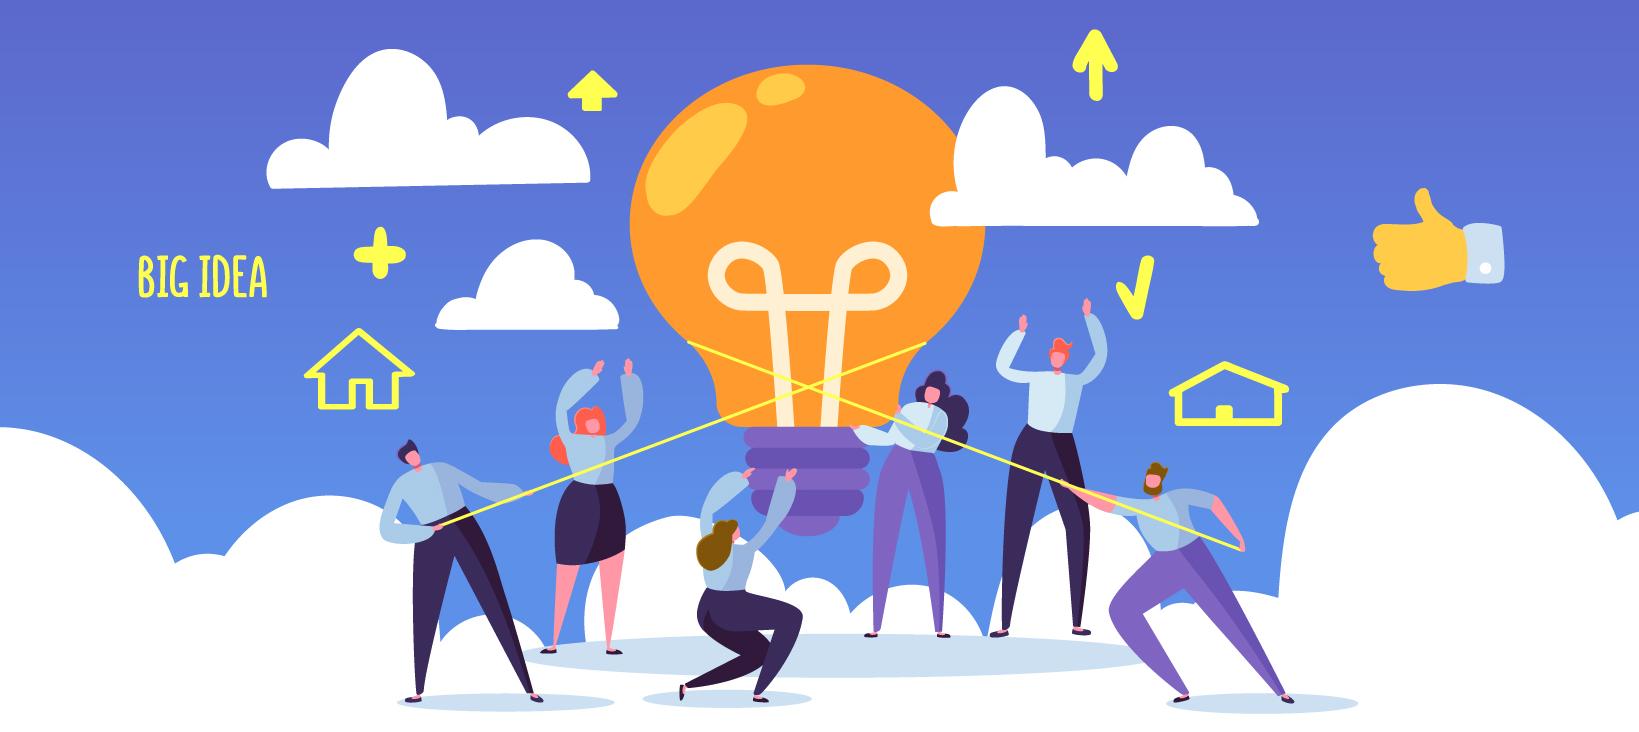 Big lightbulb with team of people celebrating ideas